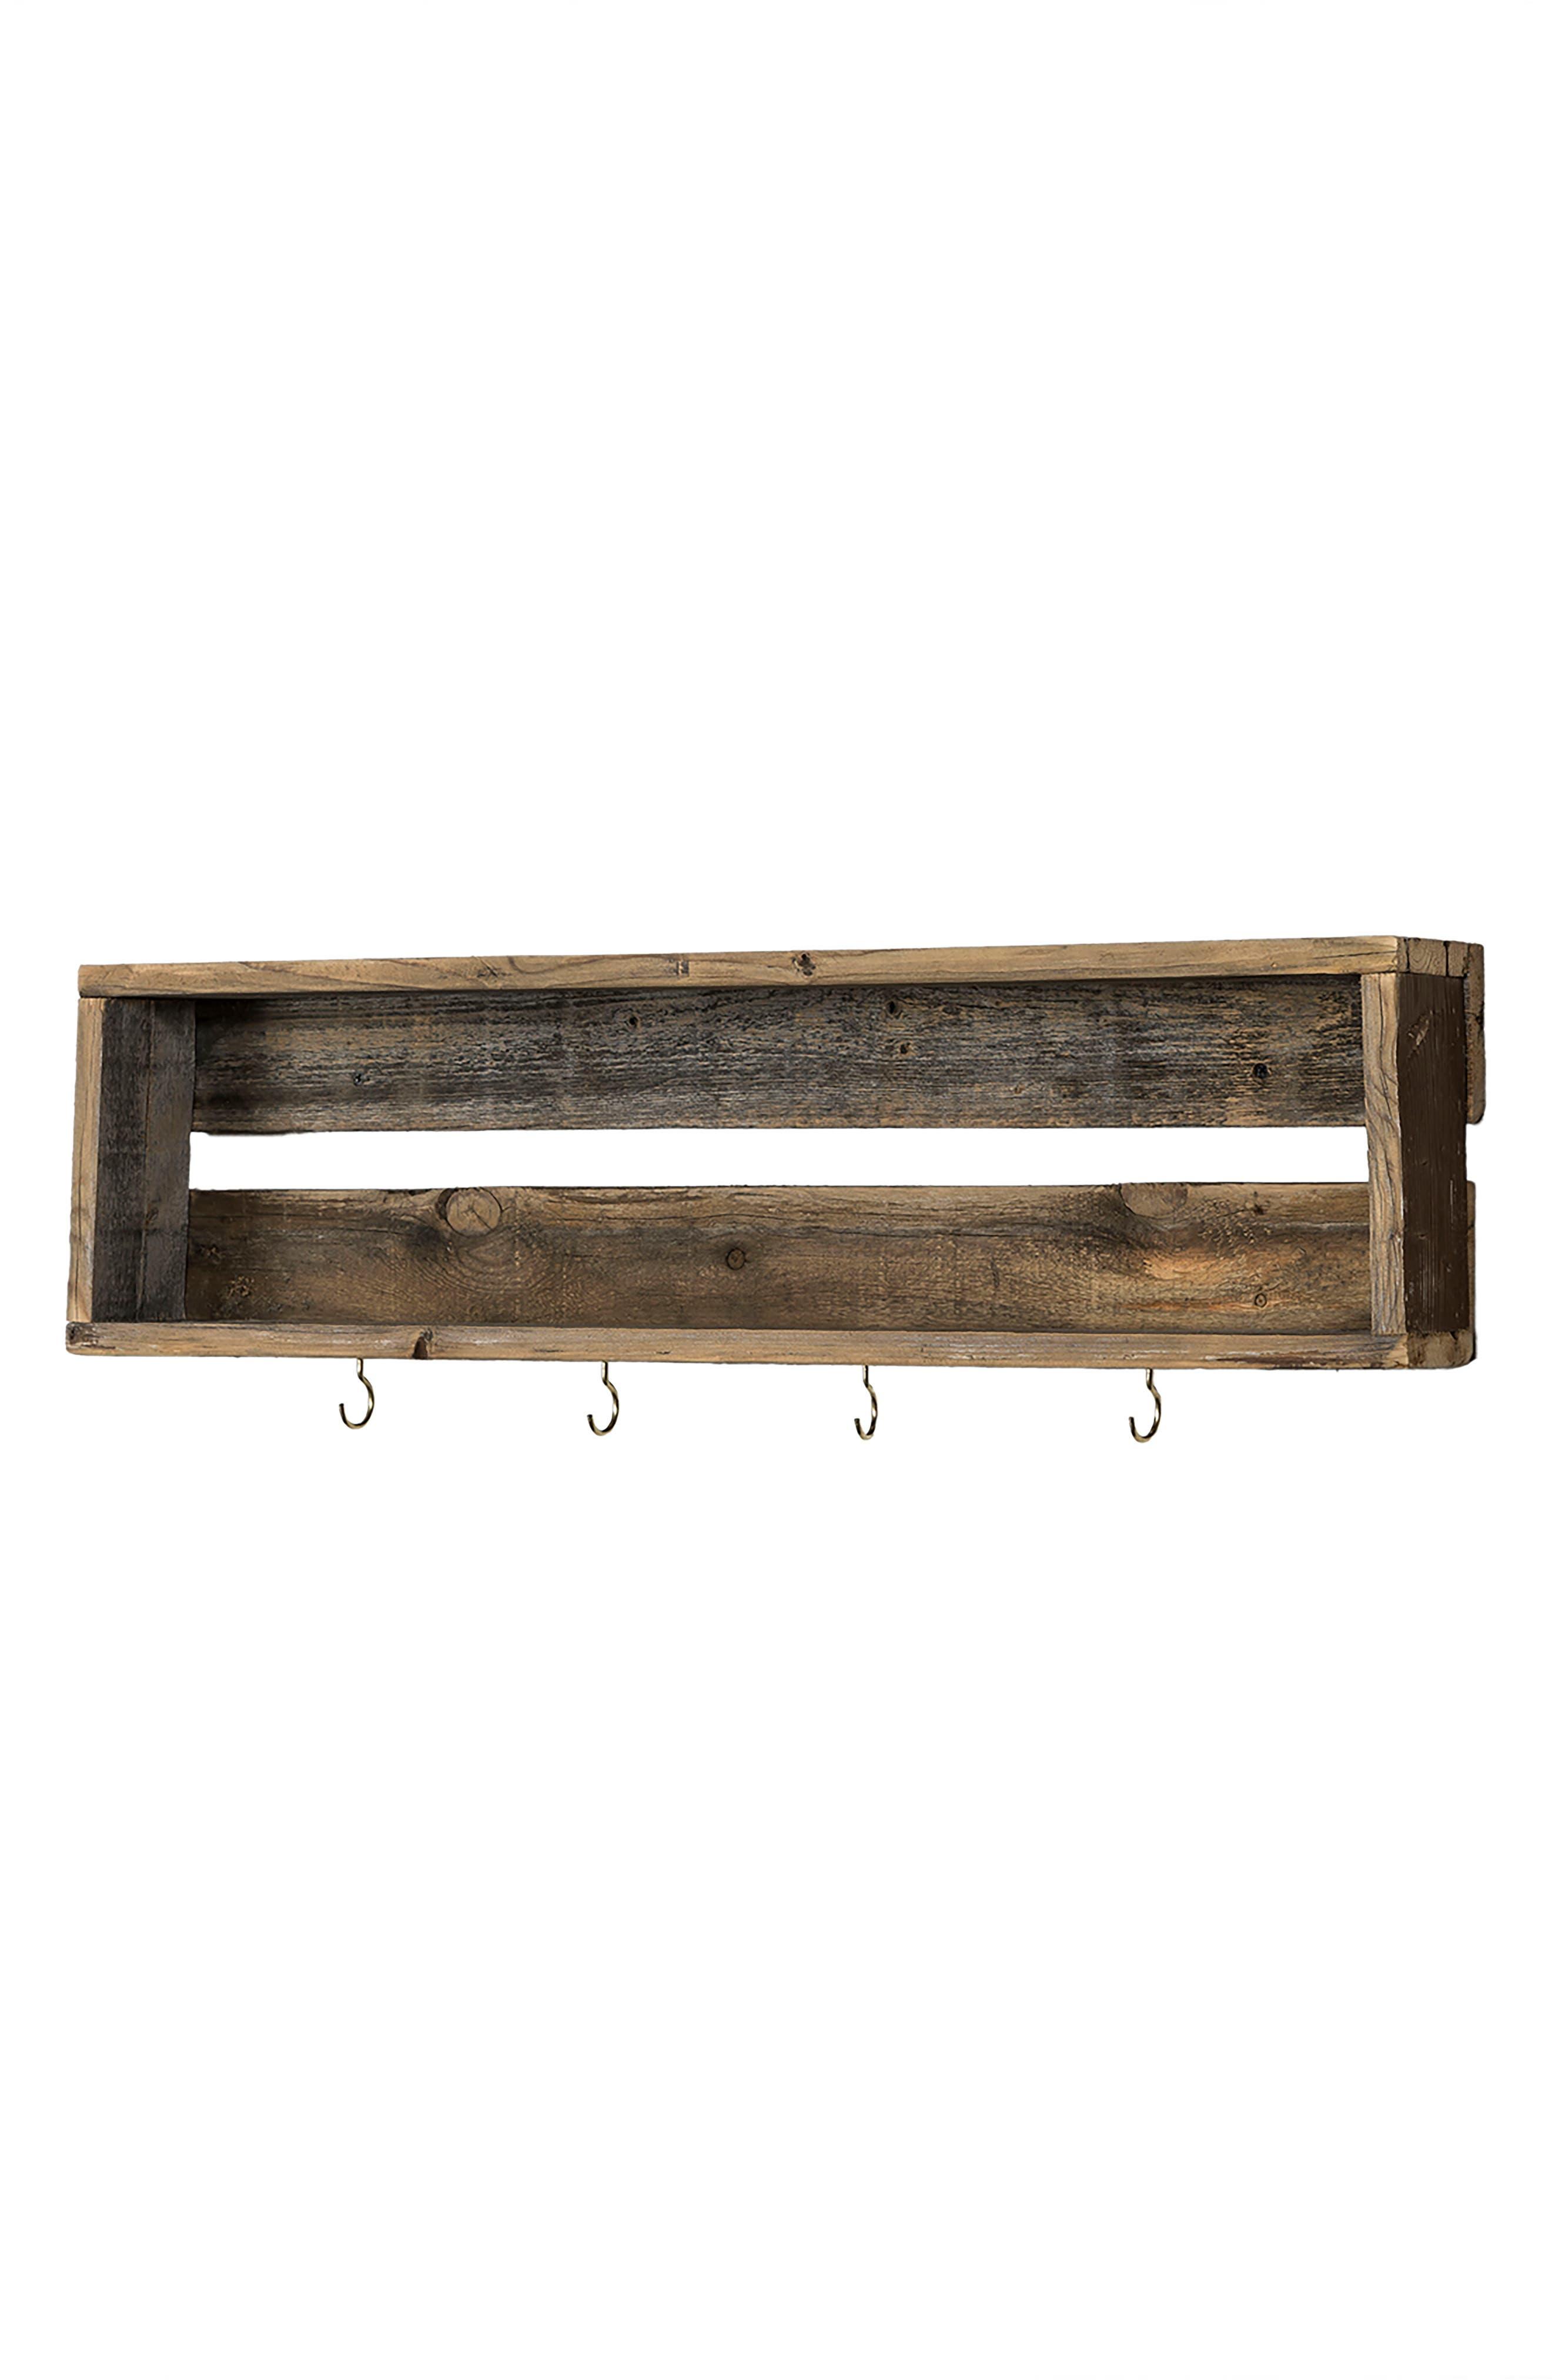 Repurposed Wood Shelf with Hooks,                             Alternate thumbnail 3, color,                             200